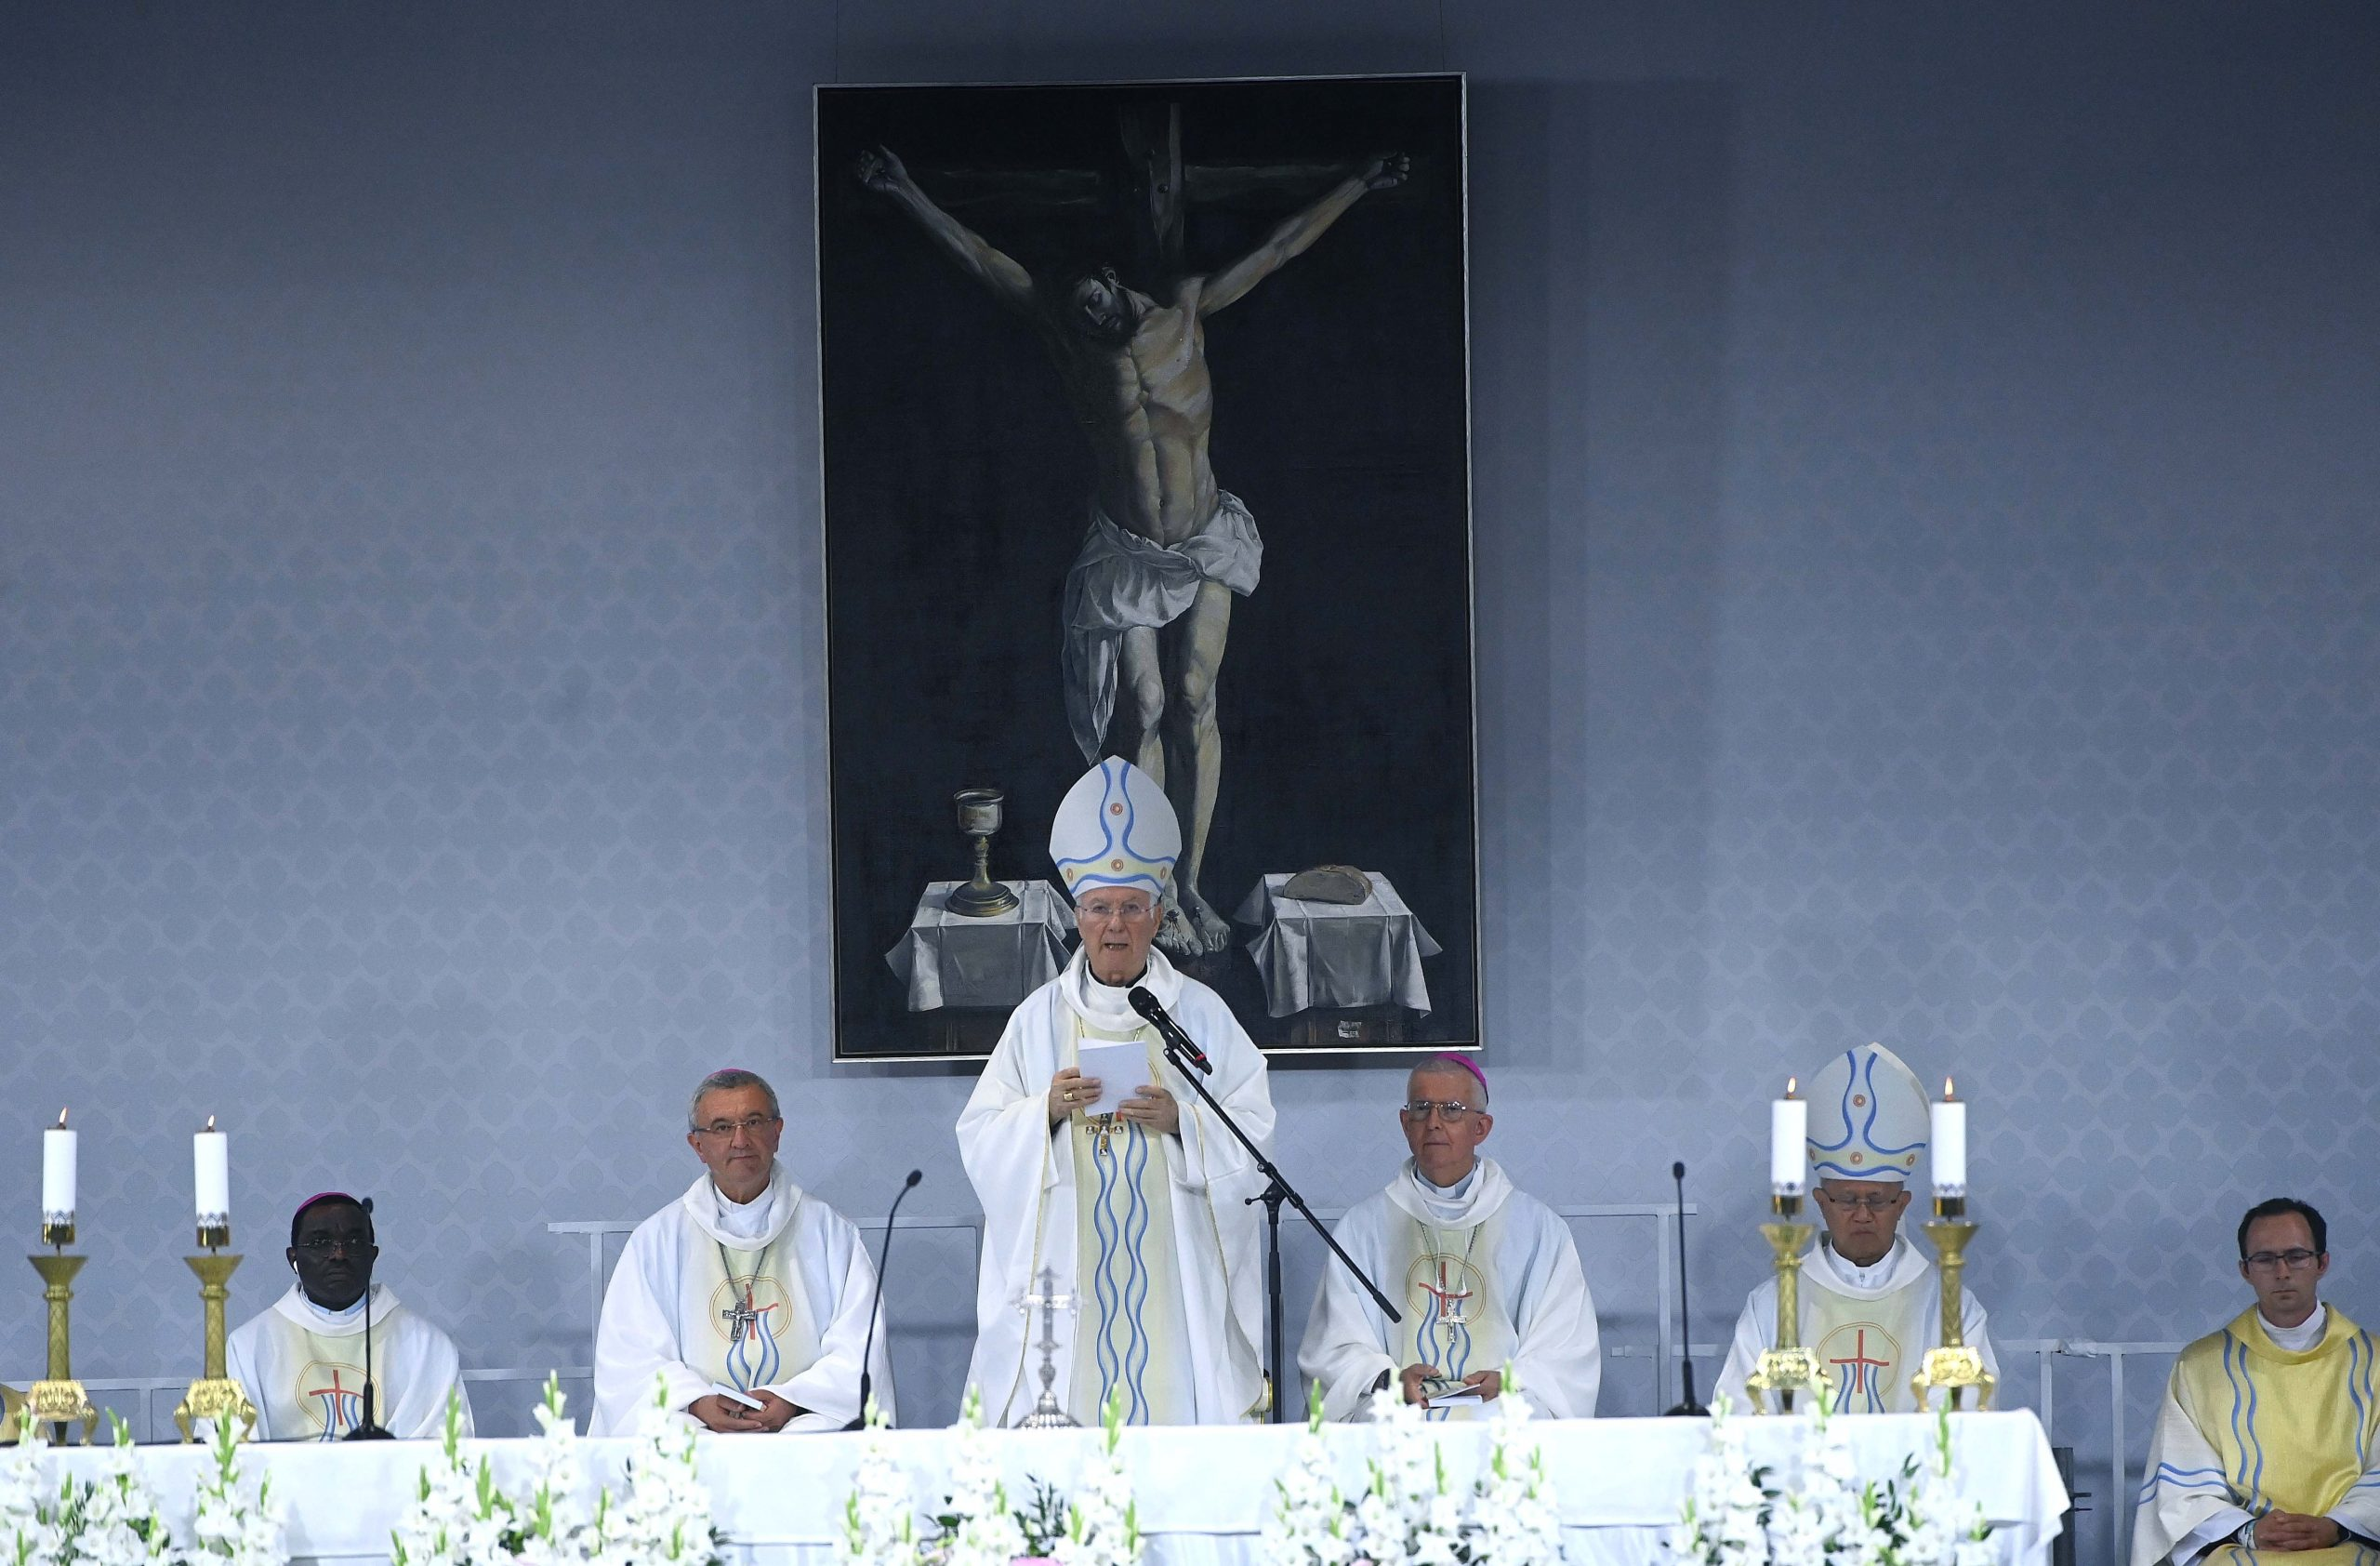 Archbishop Marini at IEC: Christians Must Make Testimony Through Personal Example